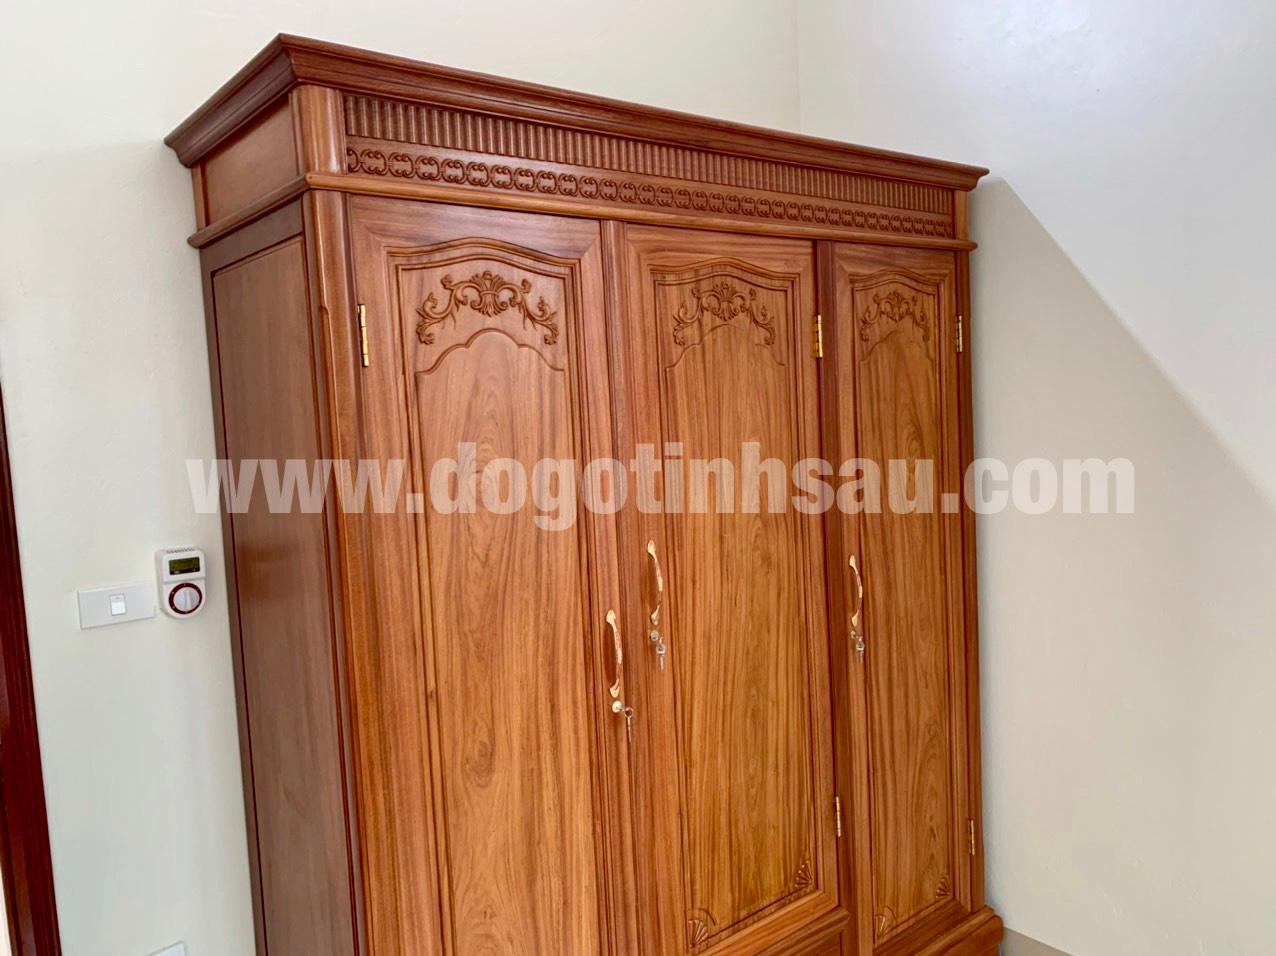 tu ao go 1 - Tủ áo 3 buồng gỗ gỗ đỏ (dạ trệt)